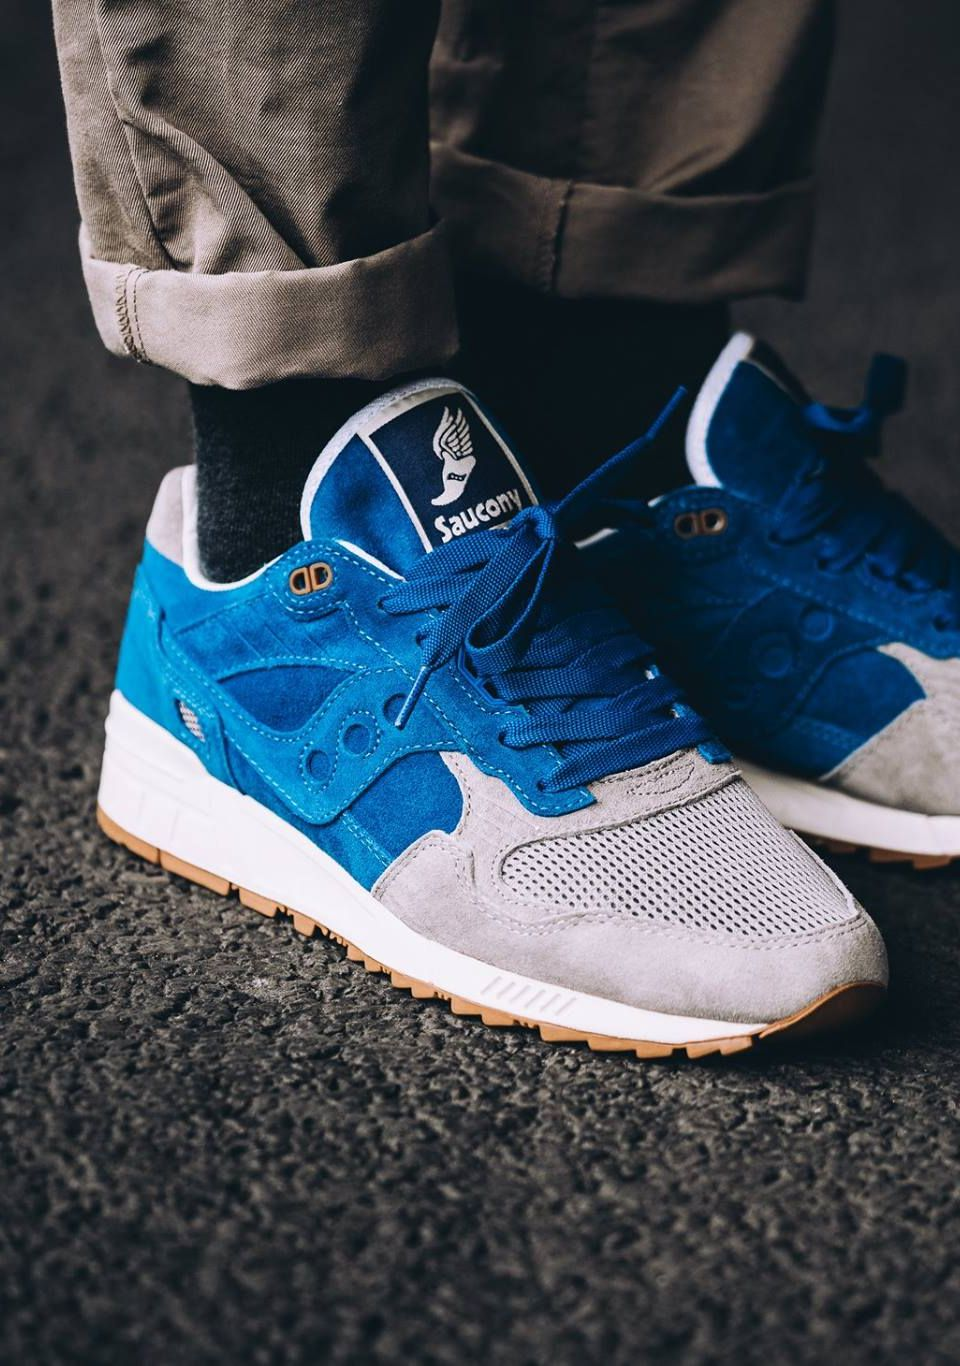 new styles 157cf 30e4d Saucony Shadow 5000  sneakernews  Sneakers  StreetStyle  Kicks  adidas   nike  vans  newbalance  puma  ADIDAS  ASICS  CONVERSE  DIADORA  REEBOK   SAUCONY